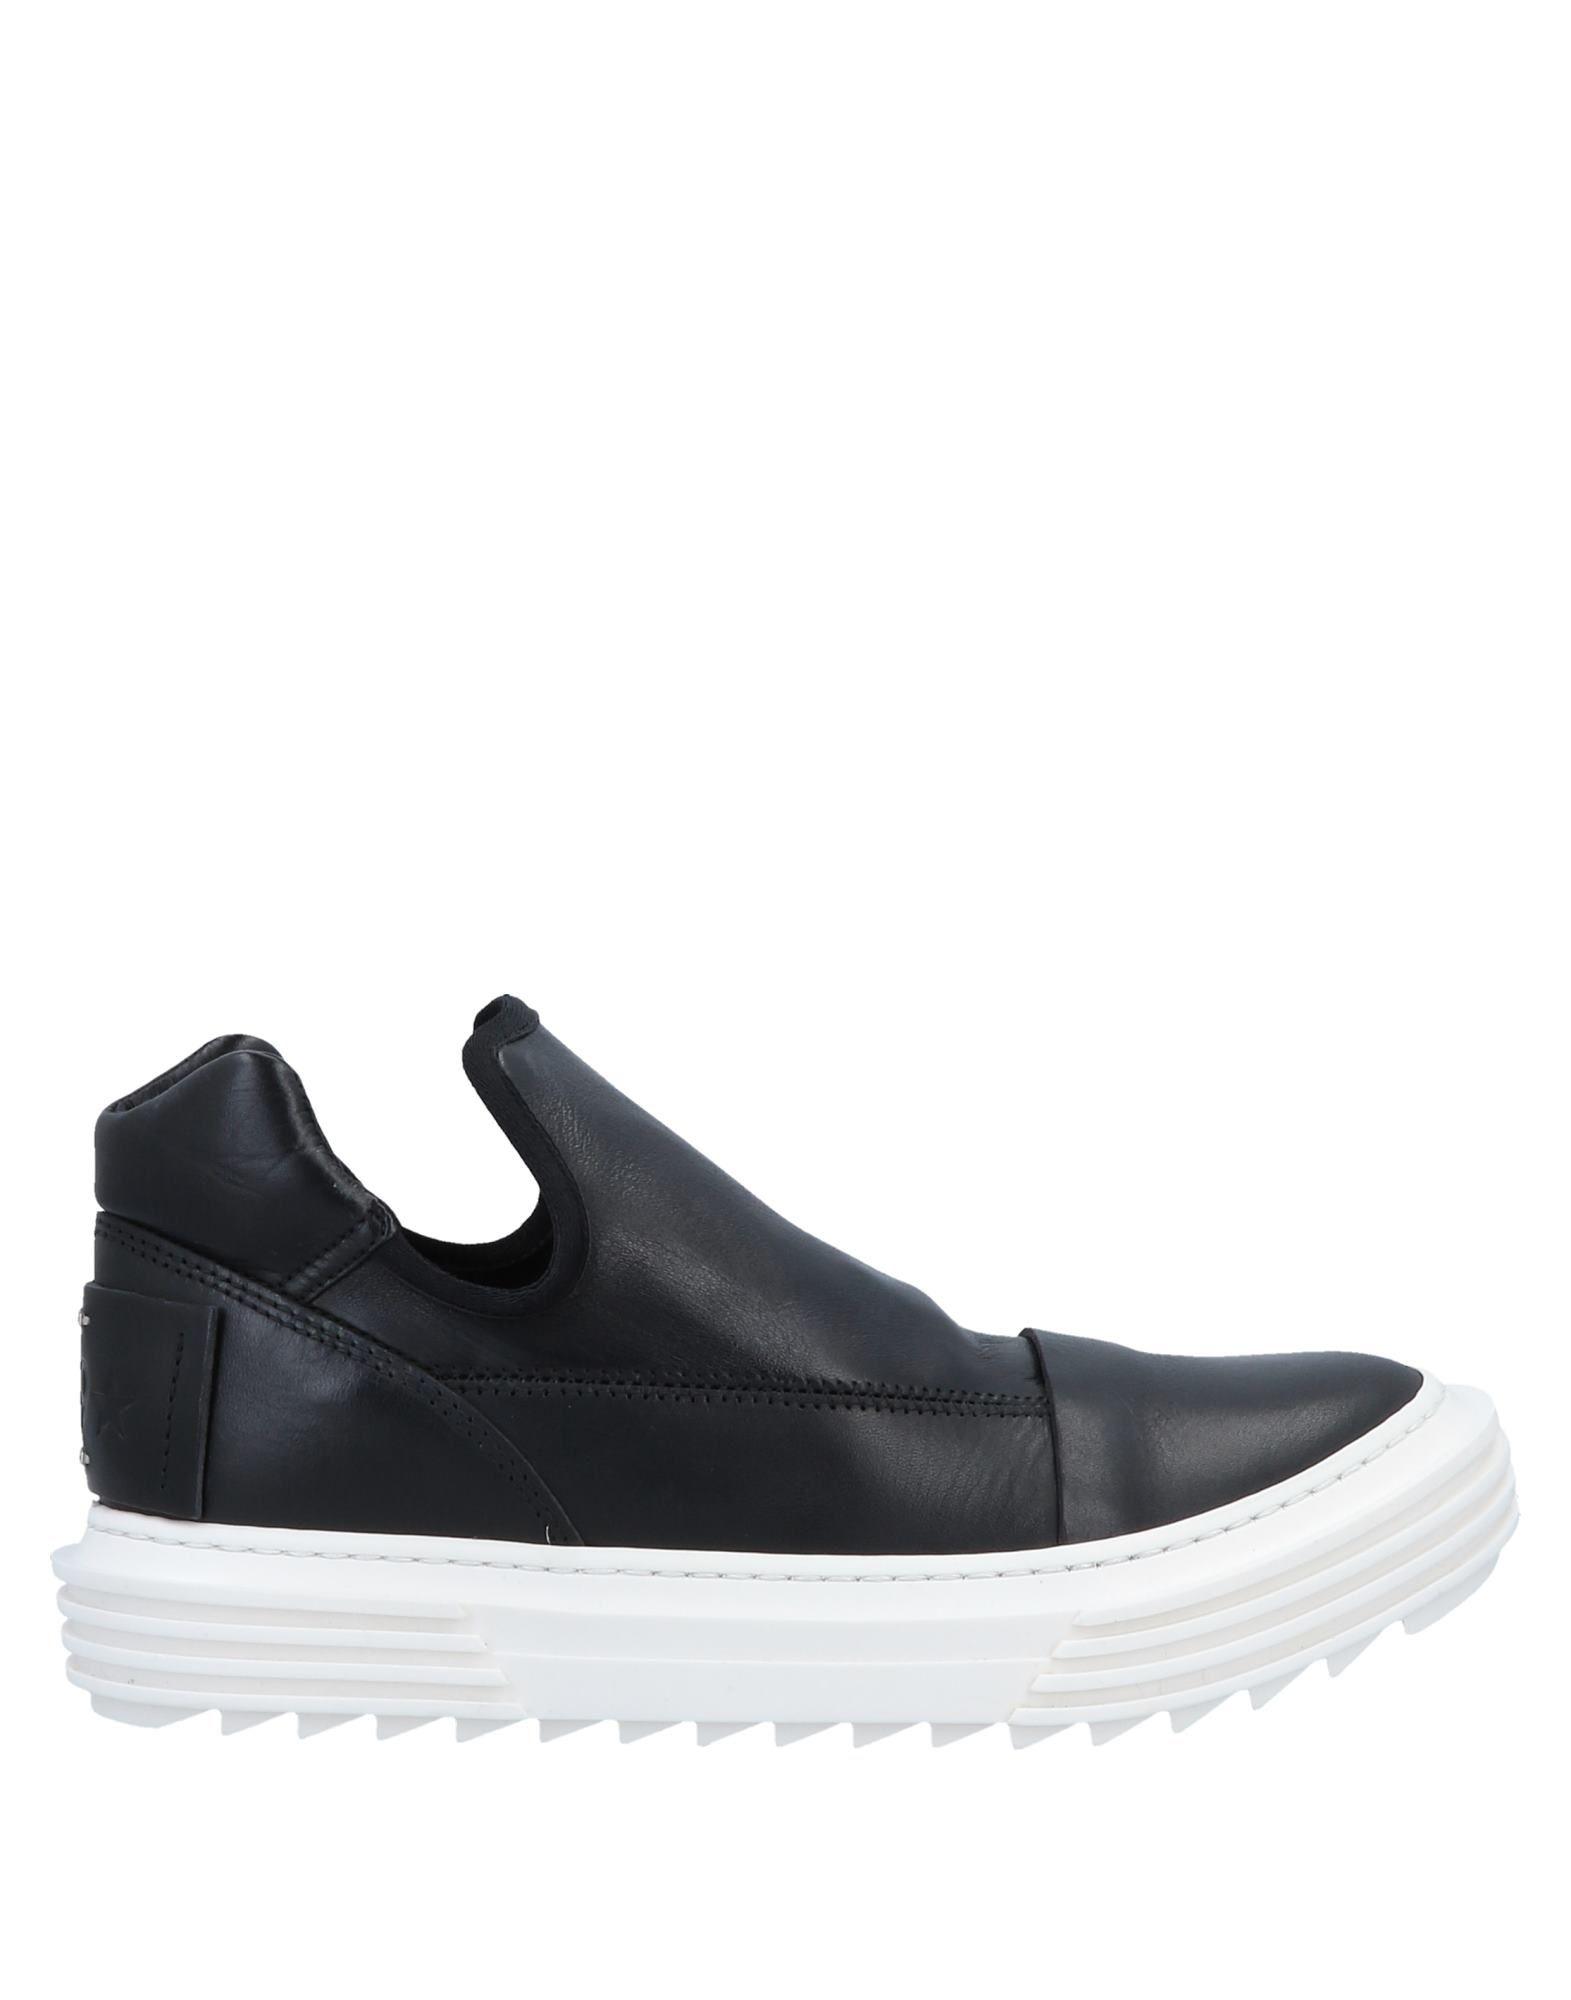 Artselab on Sneakers - Women Artselab Sneakers online on Artselab  Canada - 11568953TK 125263